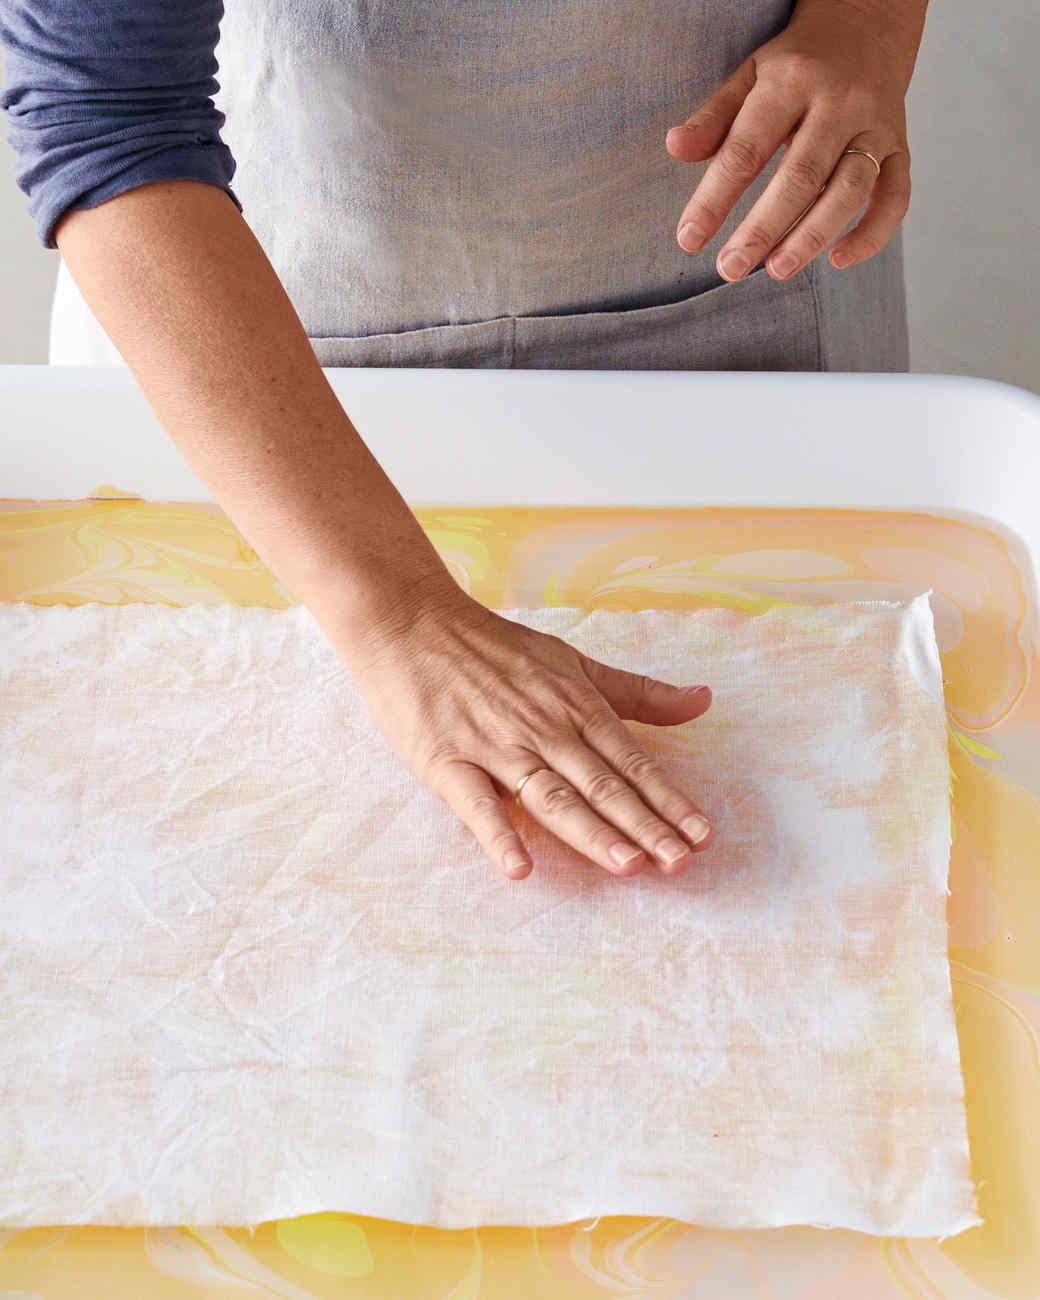 marble-process-0791-md110796.jpg